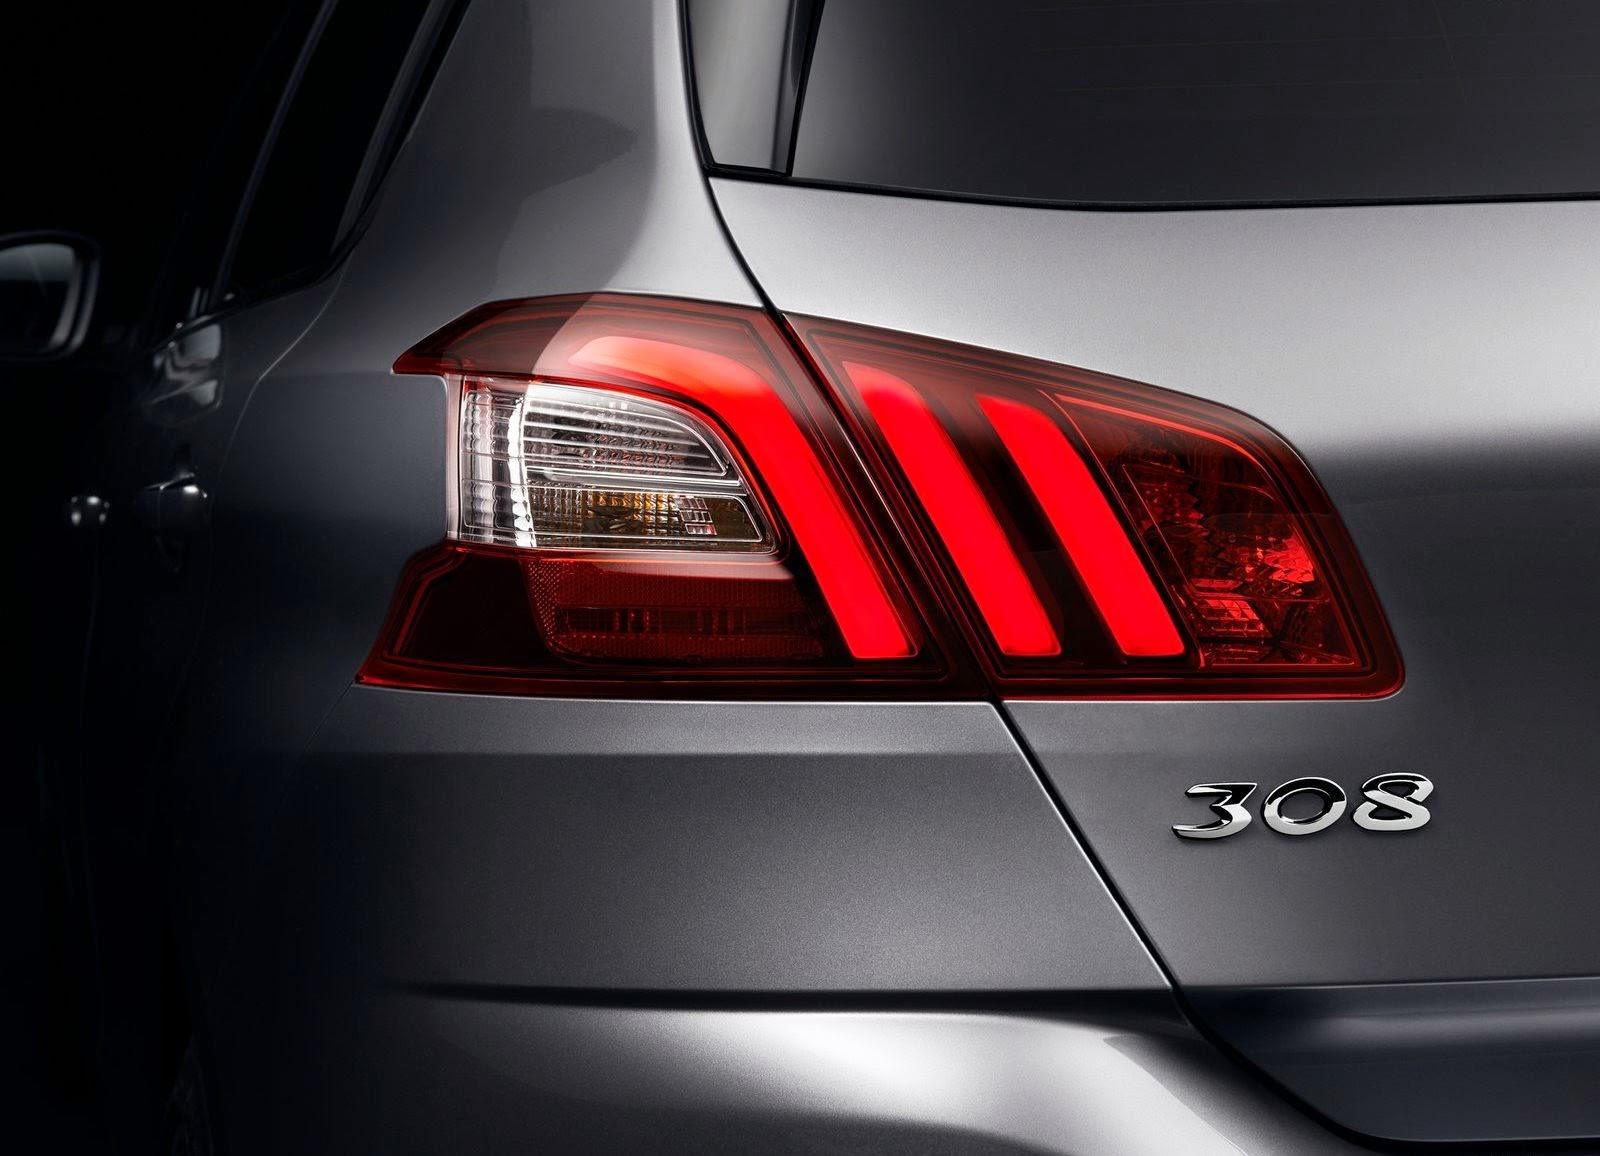 Peugeot 360 176 view rcz gt line rhd - Peugeot 360 176 View 308 Gt Line Rear Claw Like Lights